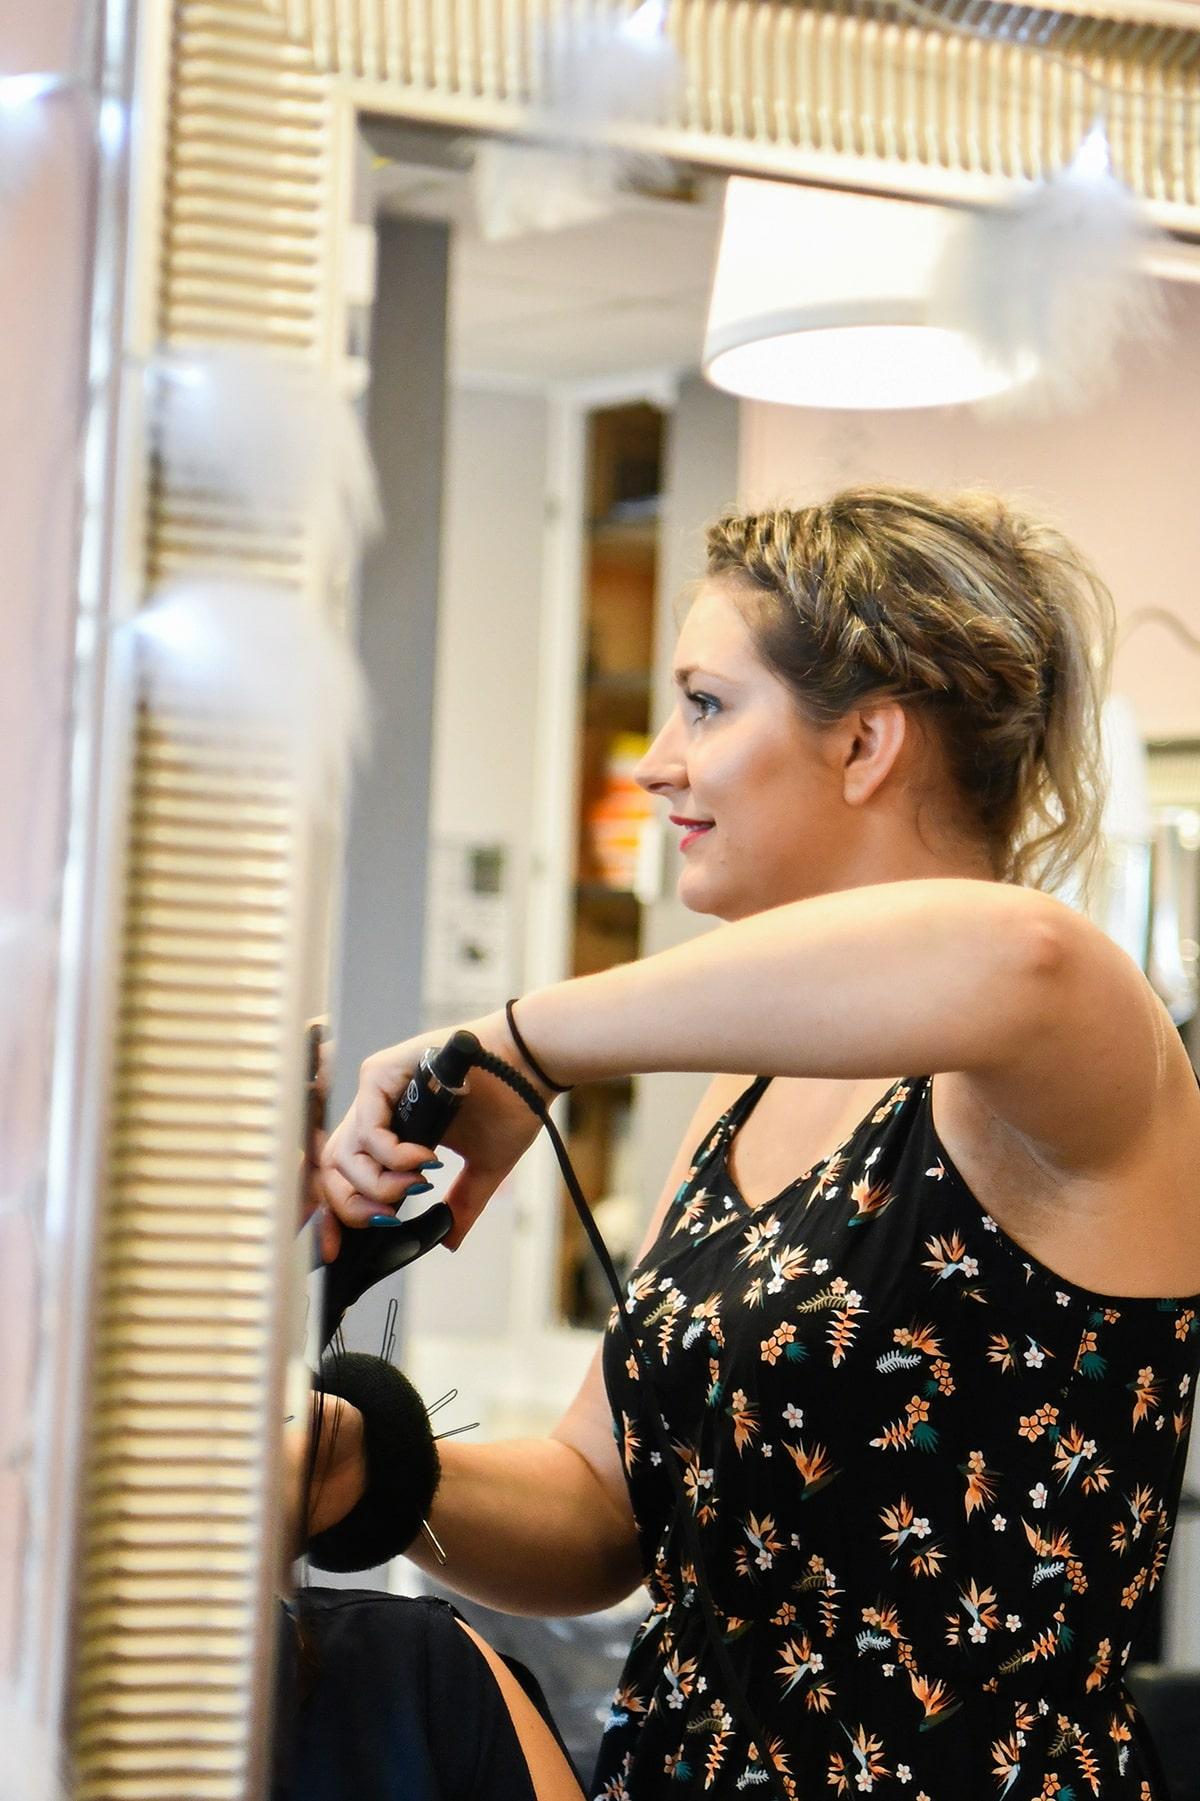 Salon de coiffure l'Atelier de Pauline, Lye